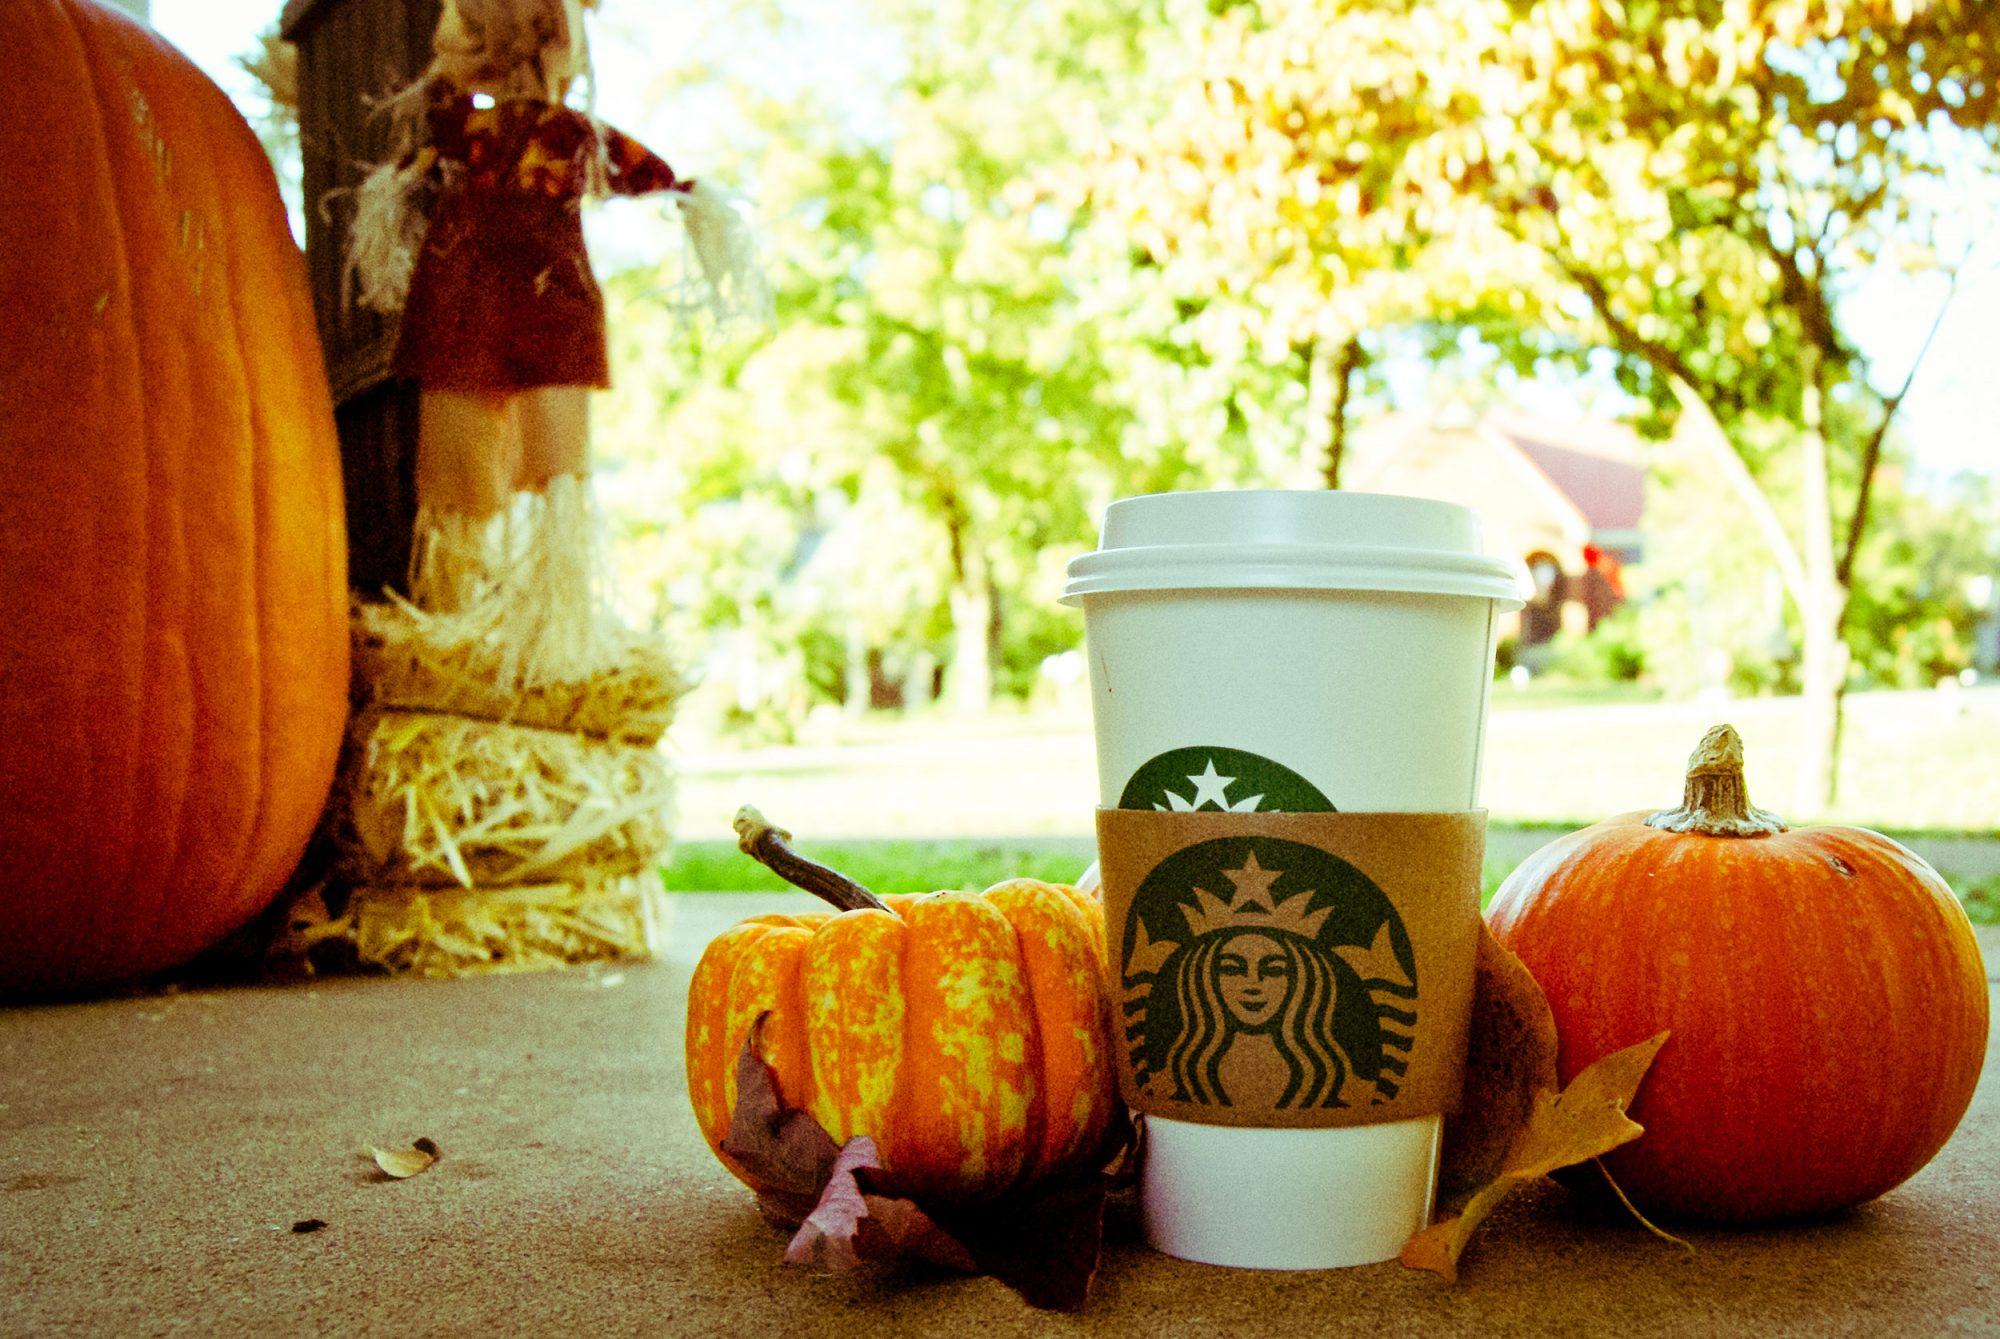 EC: How to Dress Like Pumpkin Spice for Halloween